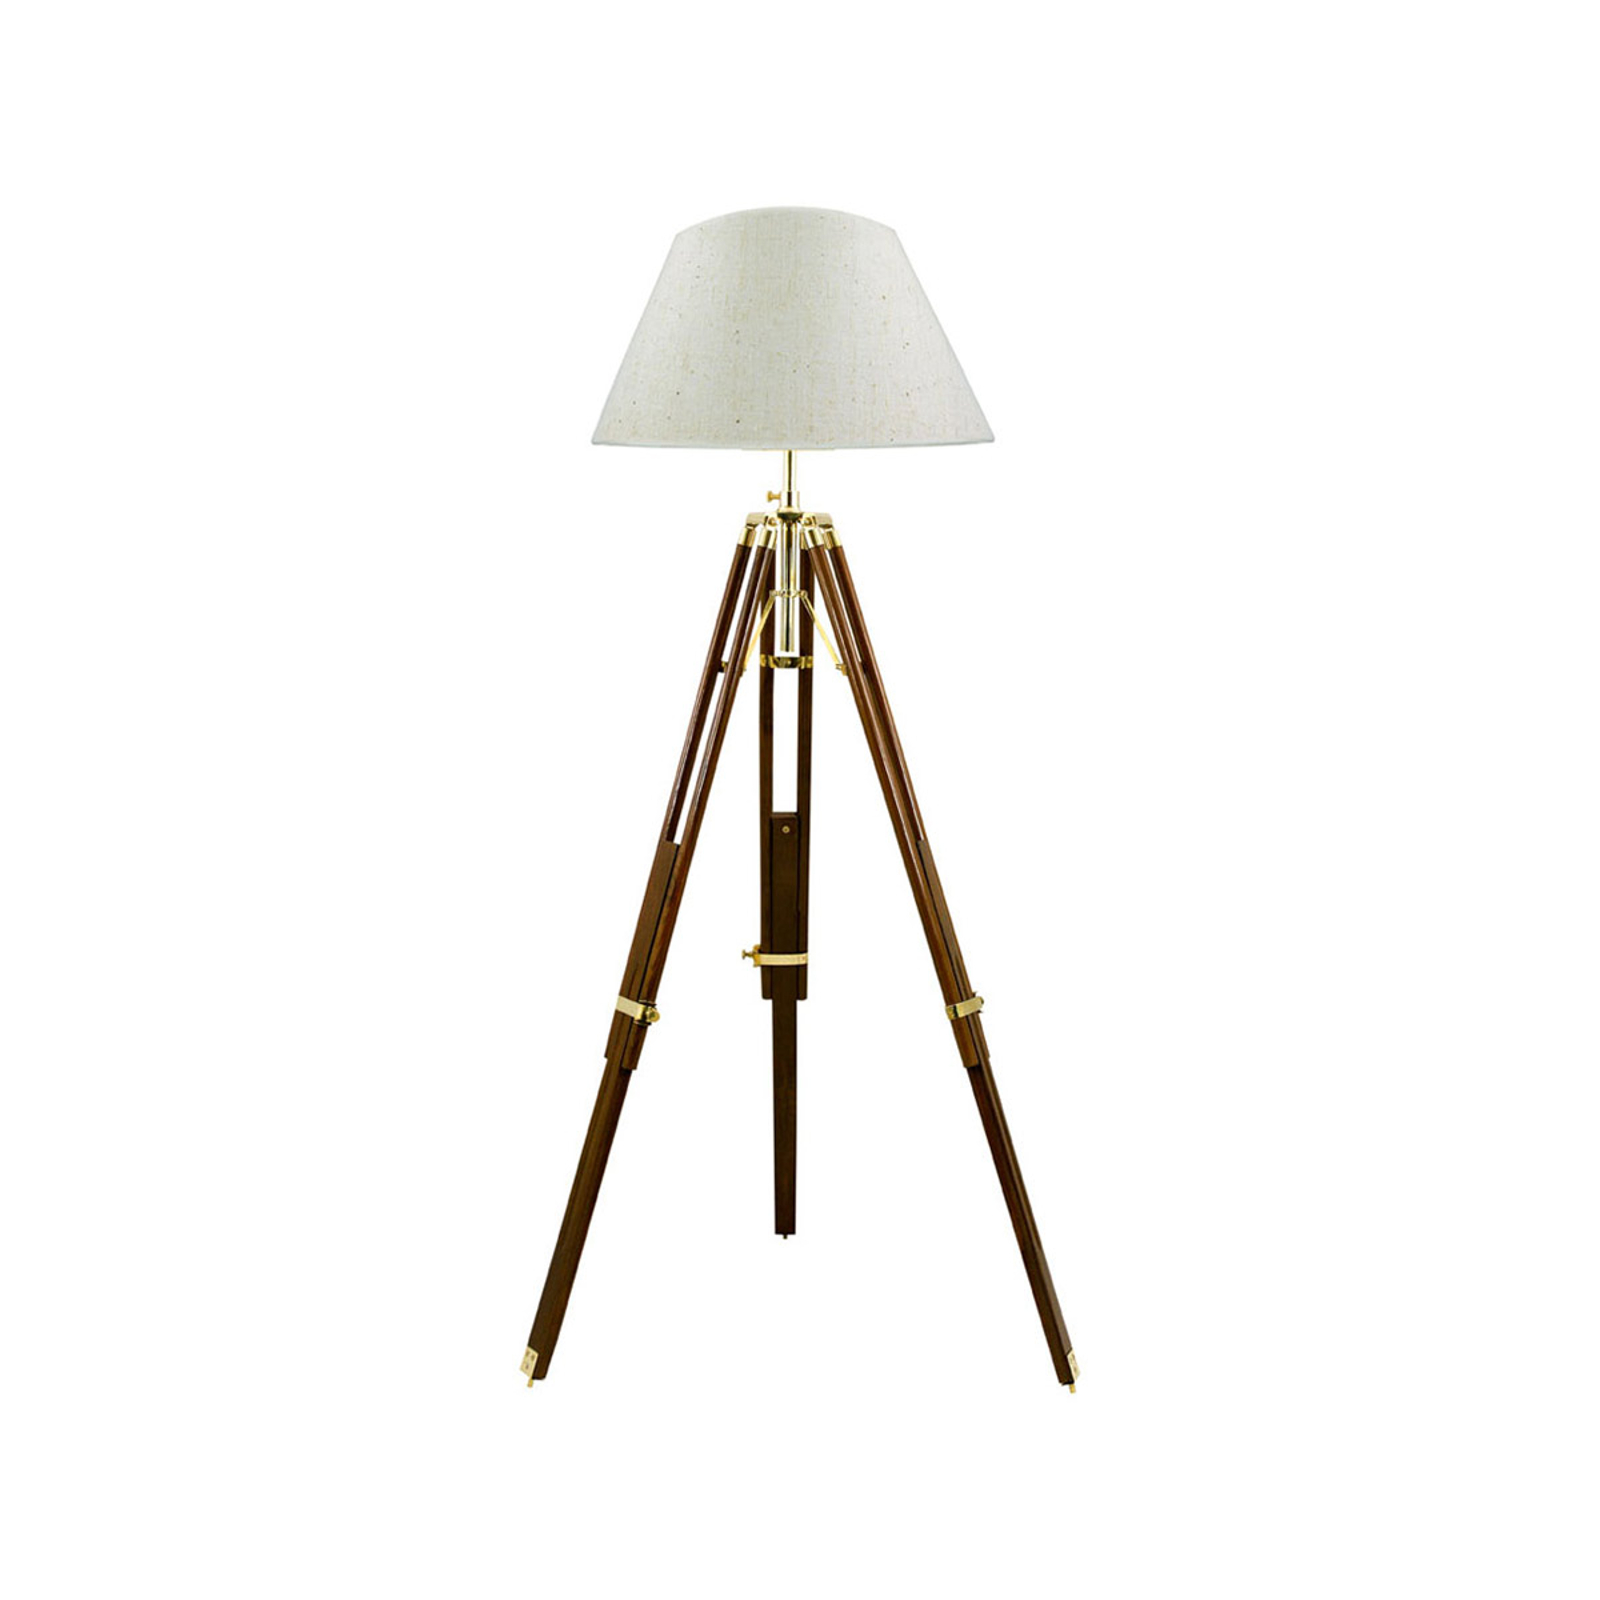 Stativ trebenet gulvlampe, juteskærm, 50 cm, creme